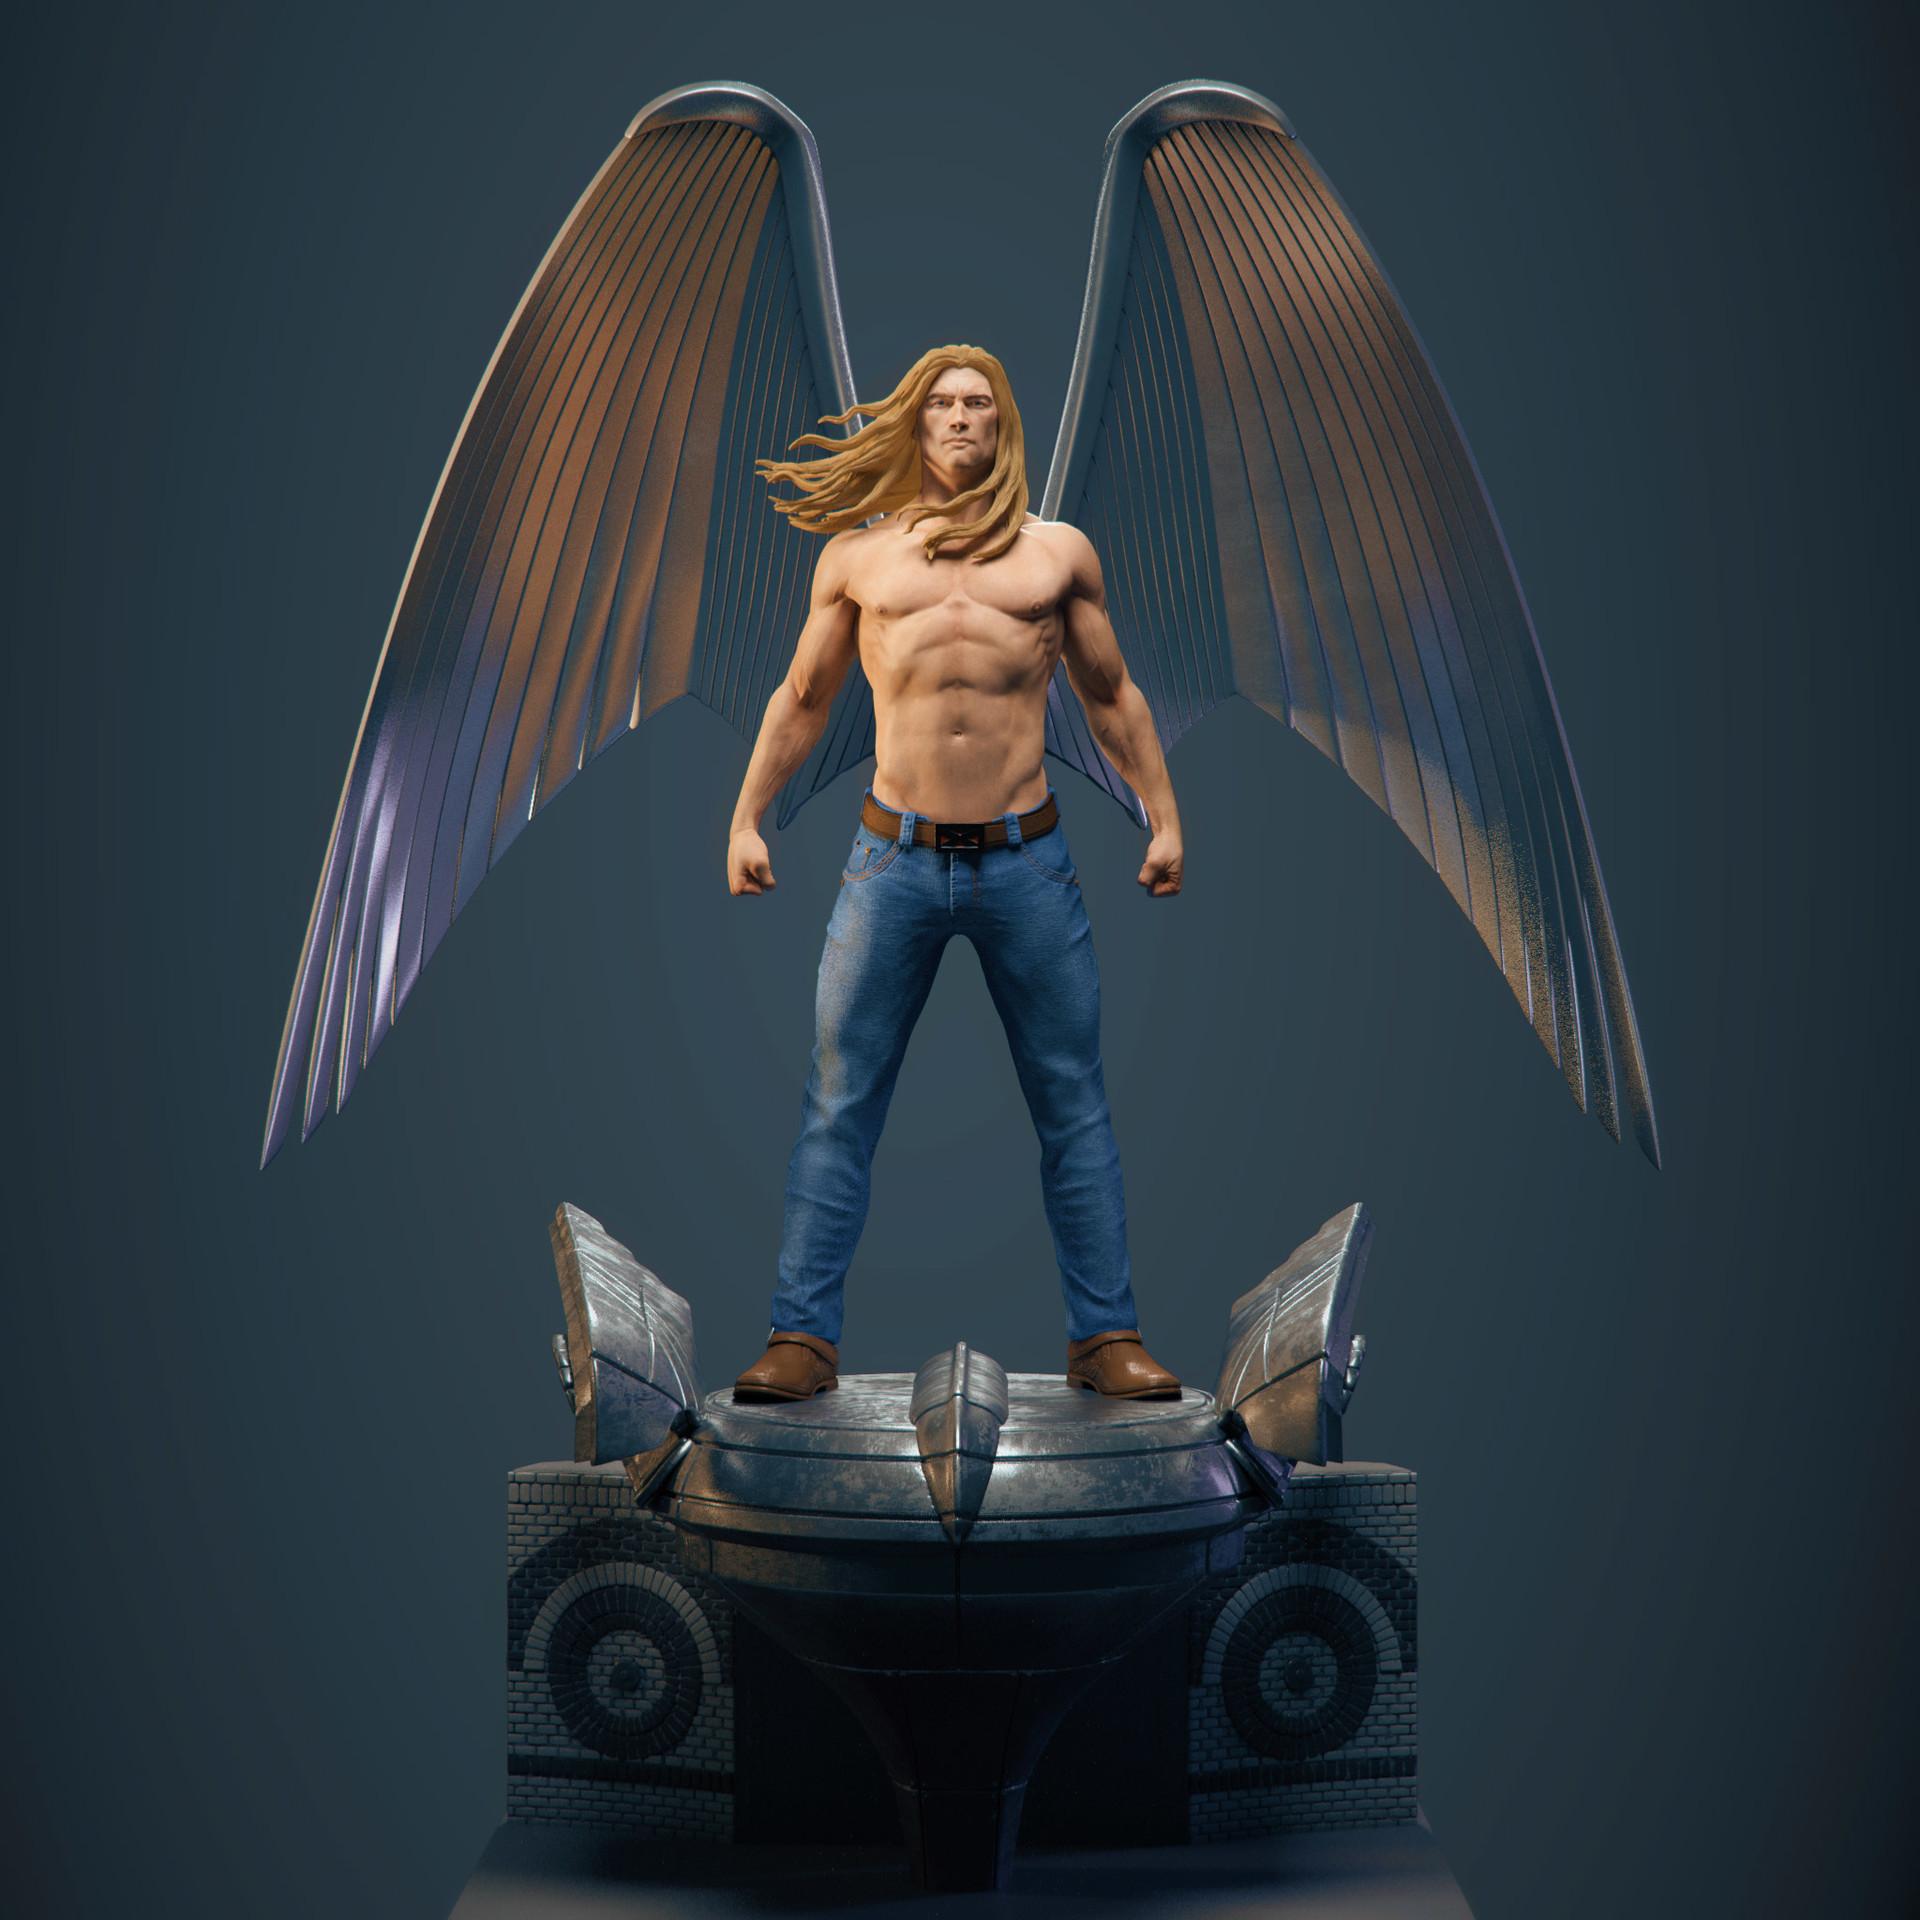 Franco carlesimo angel12 00000